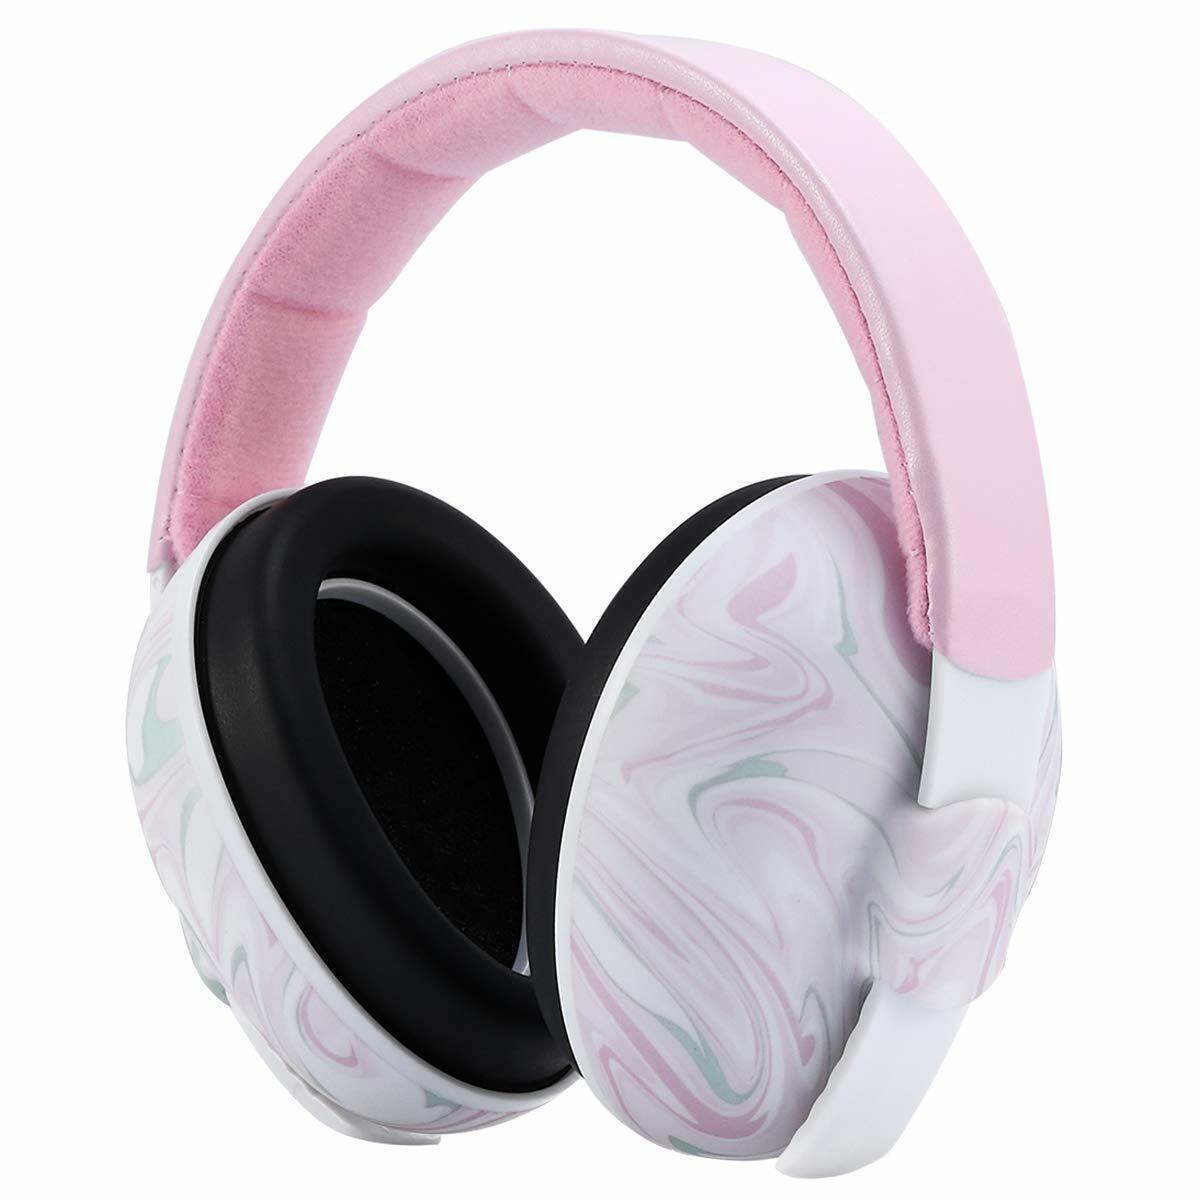 Mumba Baby Earmuffs Ear Muff Hearing Protection Kids Noise C